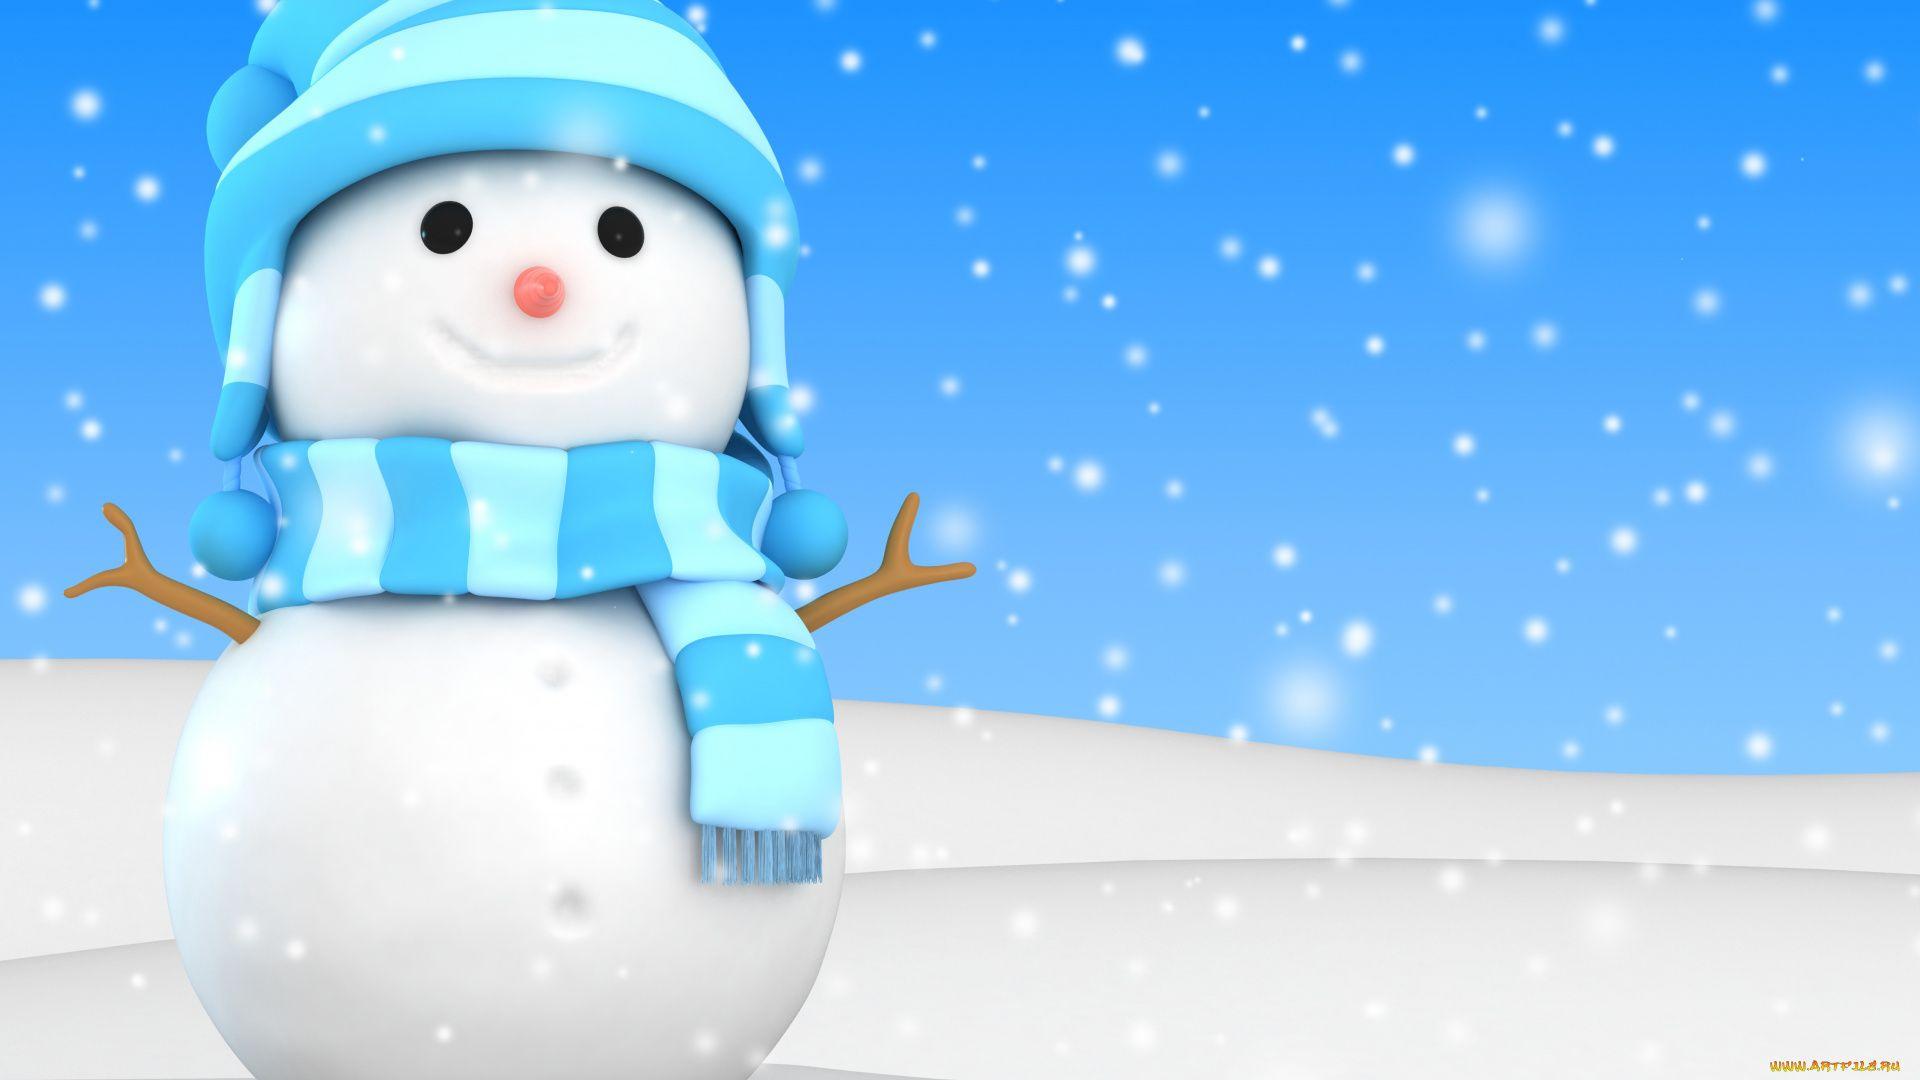 Winter 2020 free download wallpaper